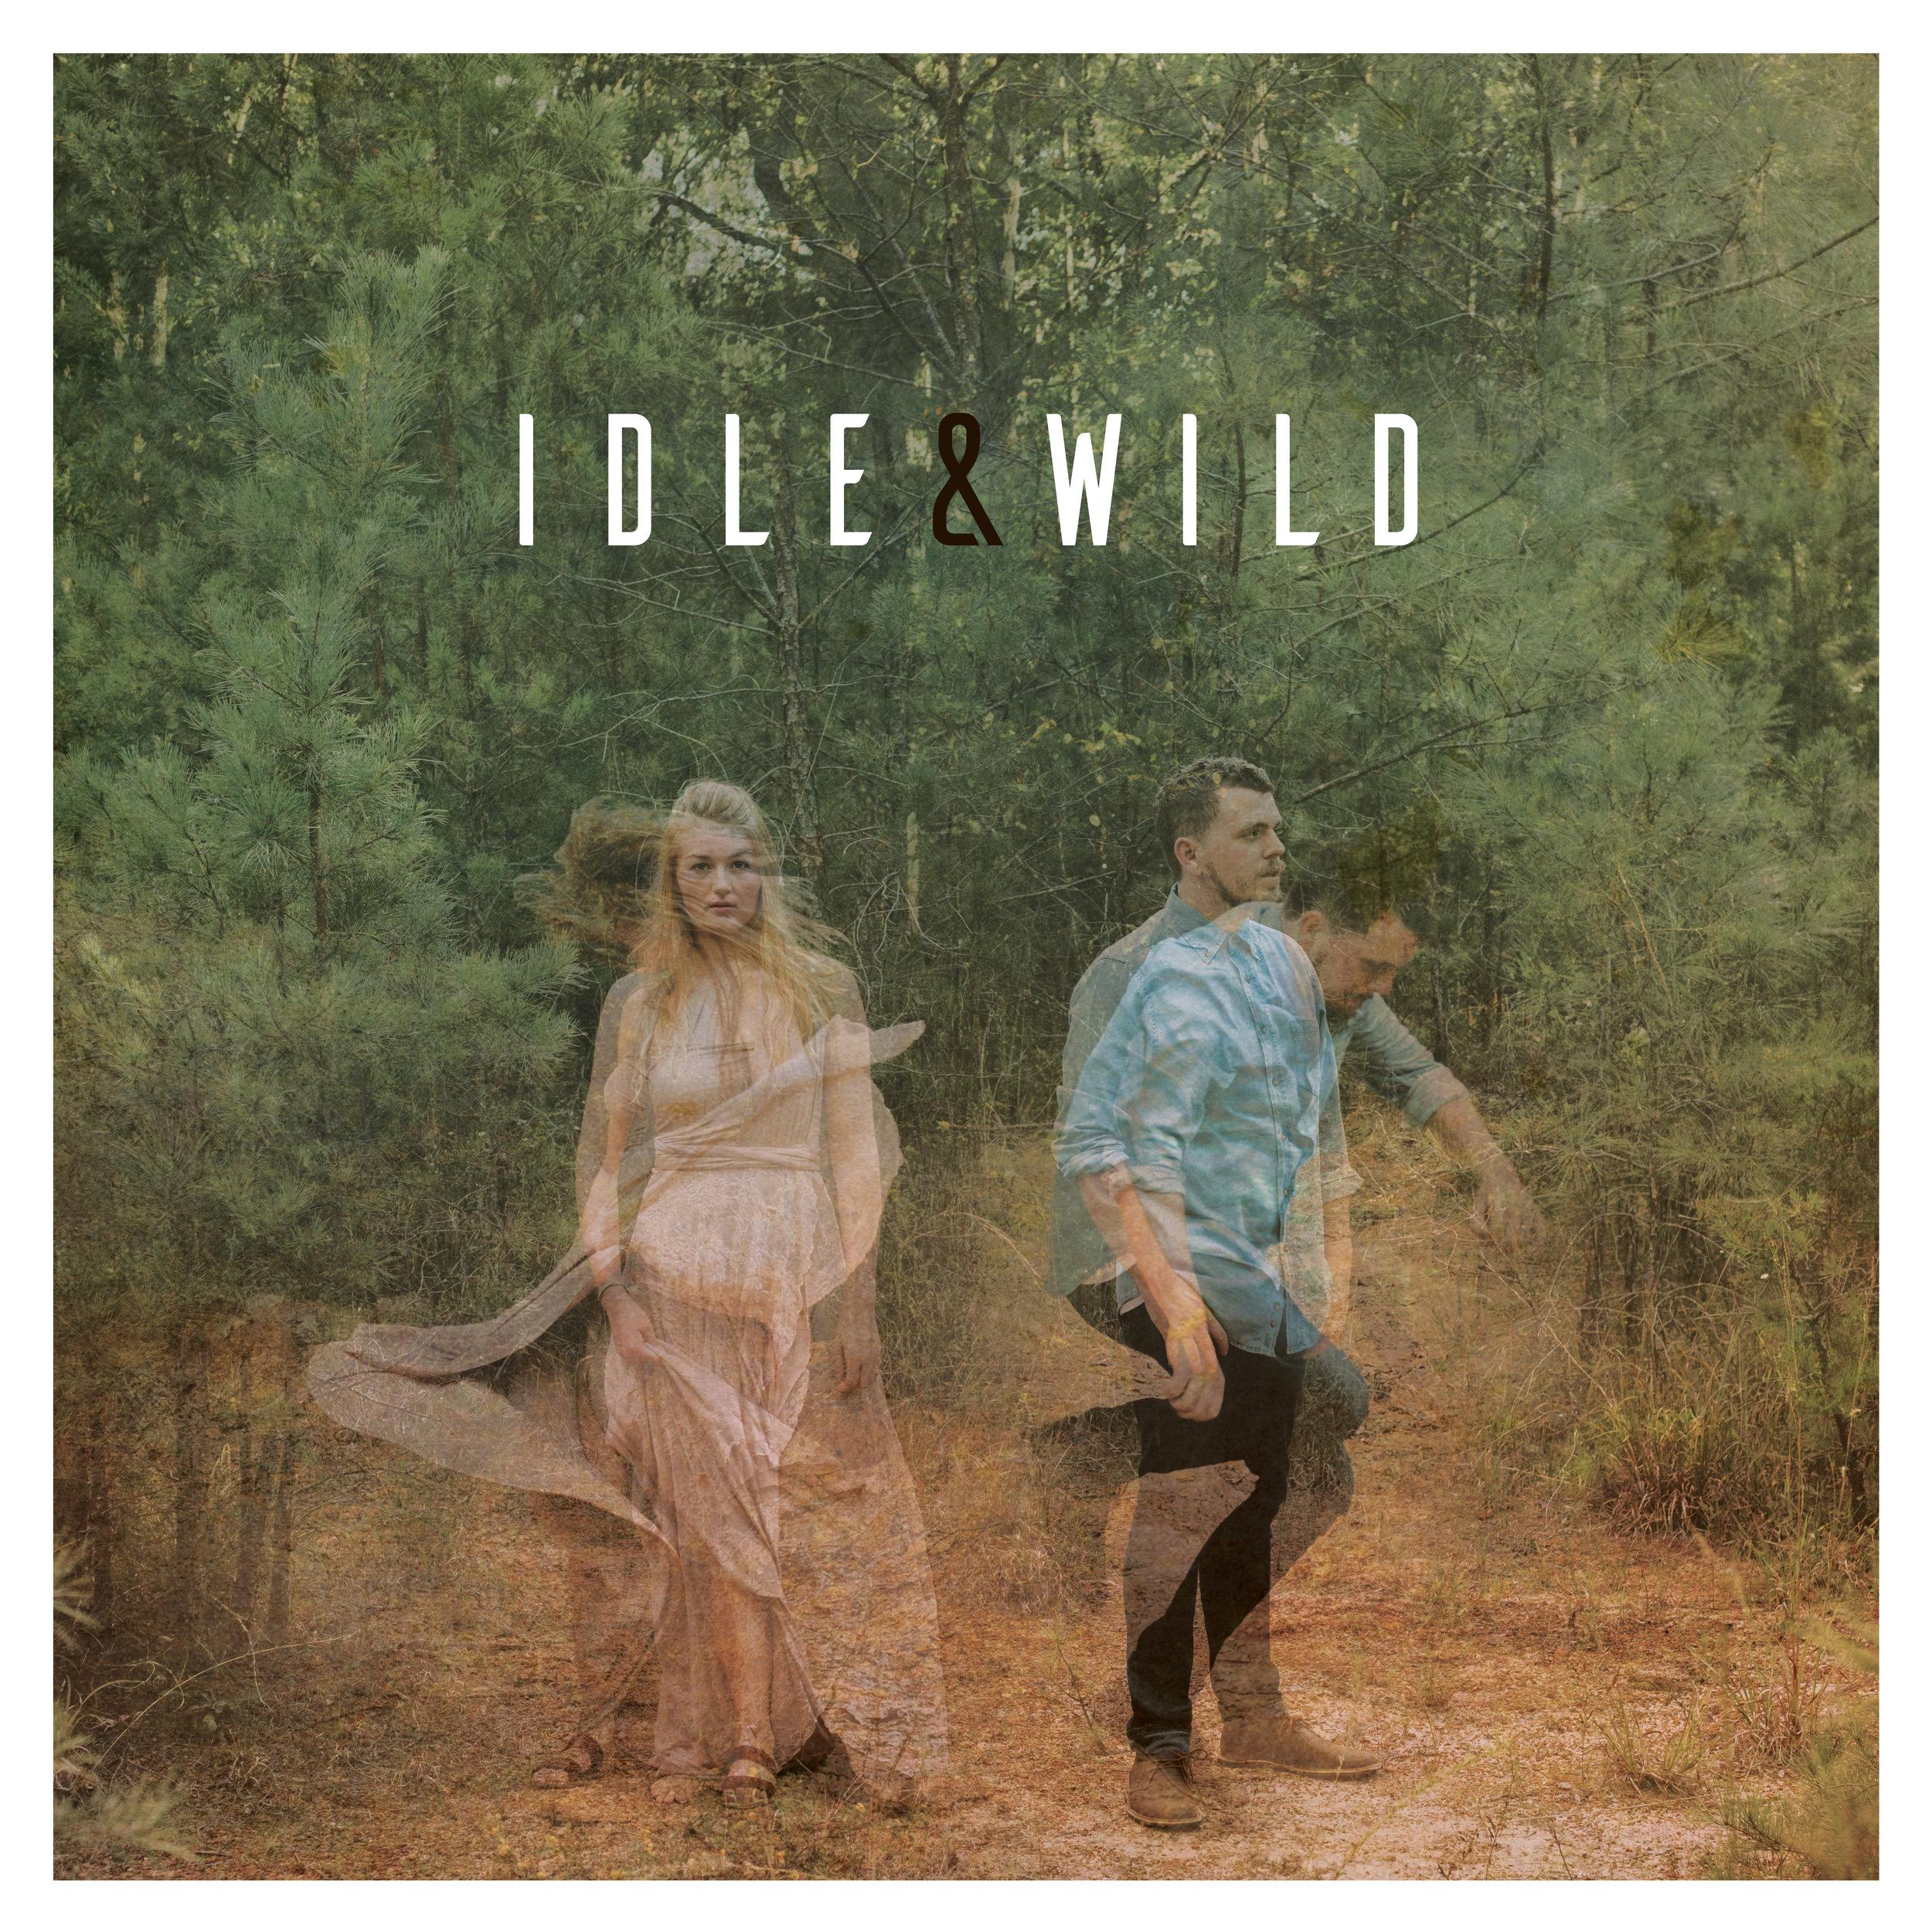 Idle & Wild: Producer. Percussion. Sound Design. - 2017